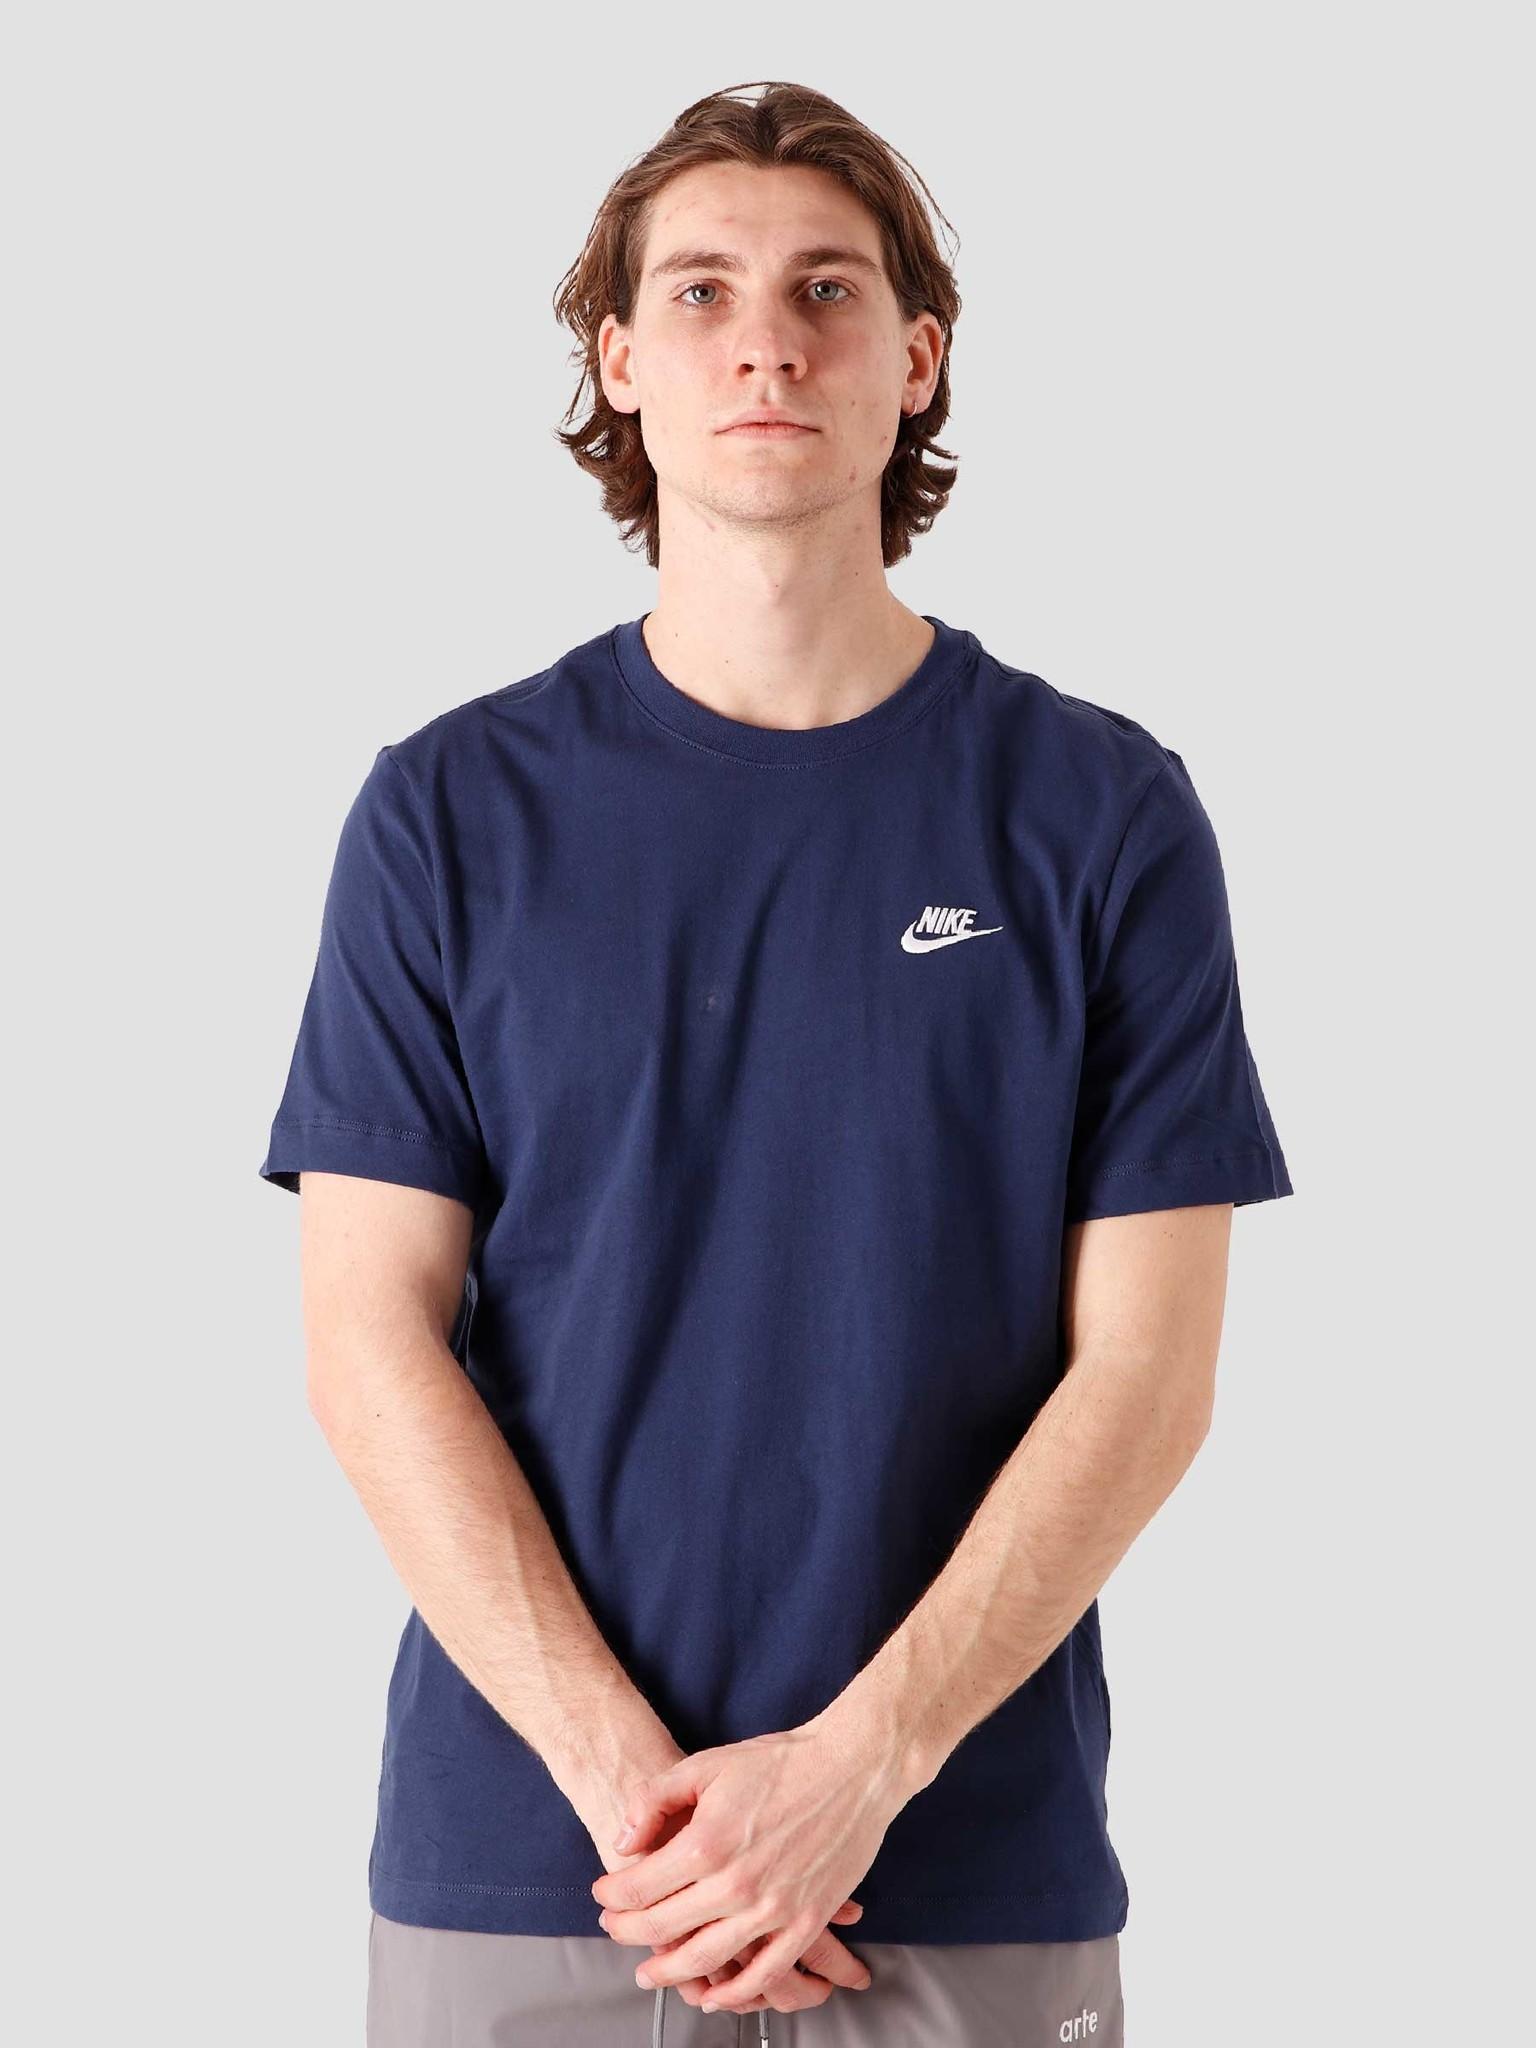 M Nsw Club T-Shirt Midnight Navy White AR4997-410